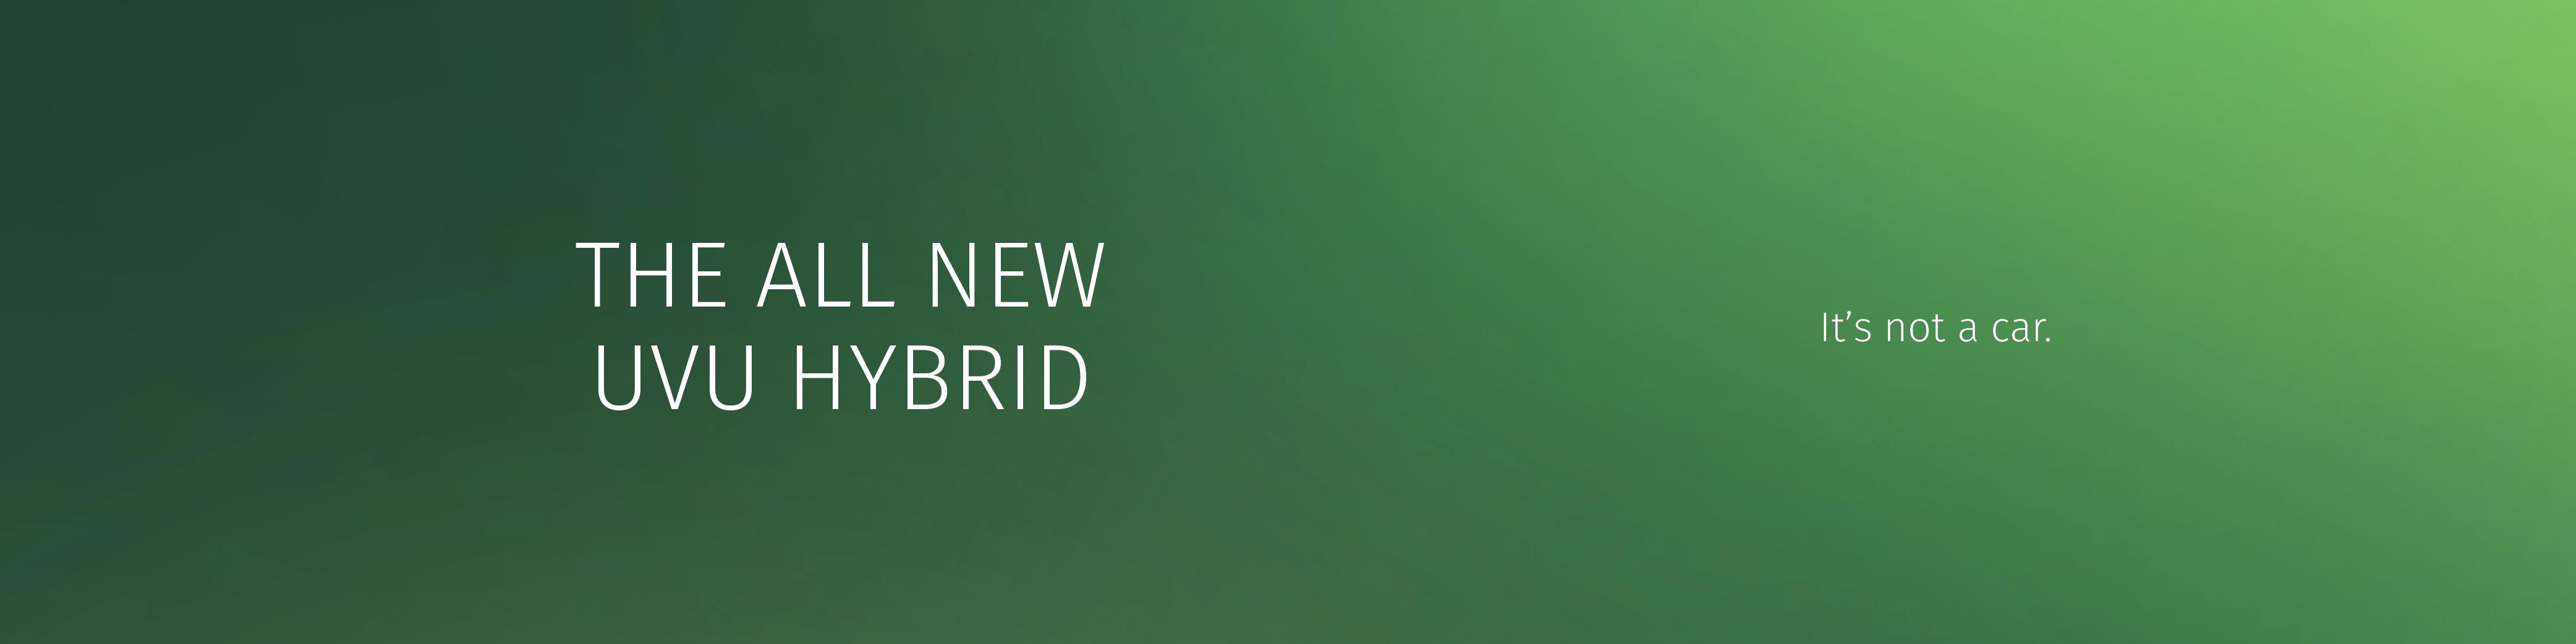 The All New UVU Hybrid